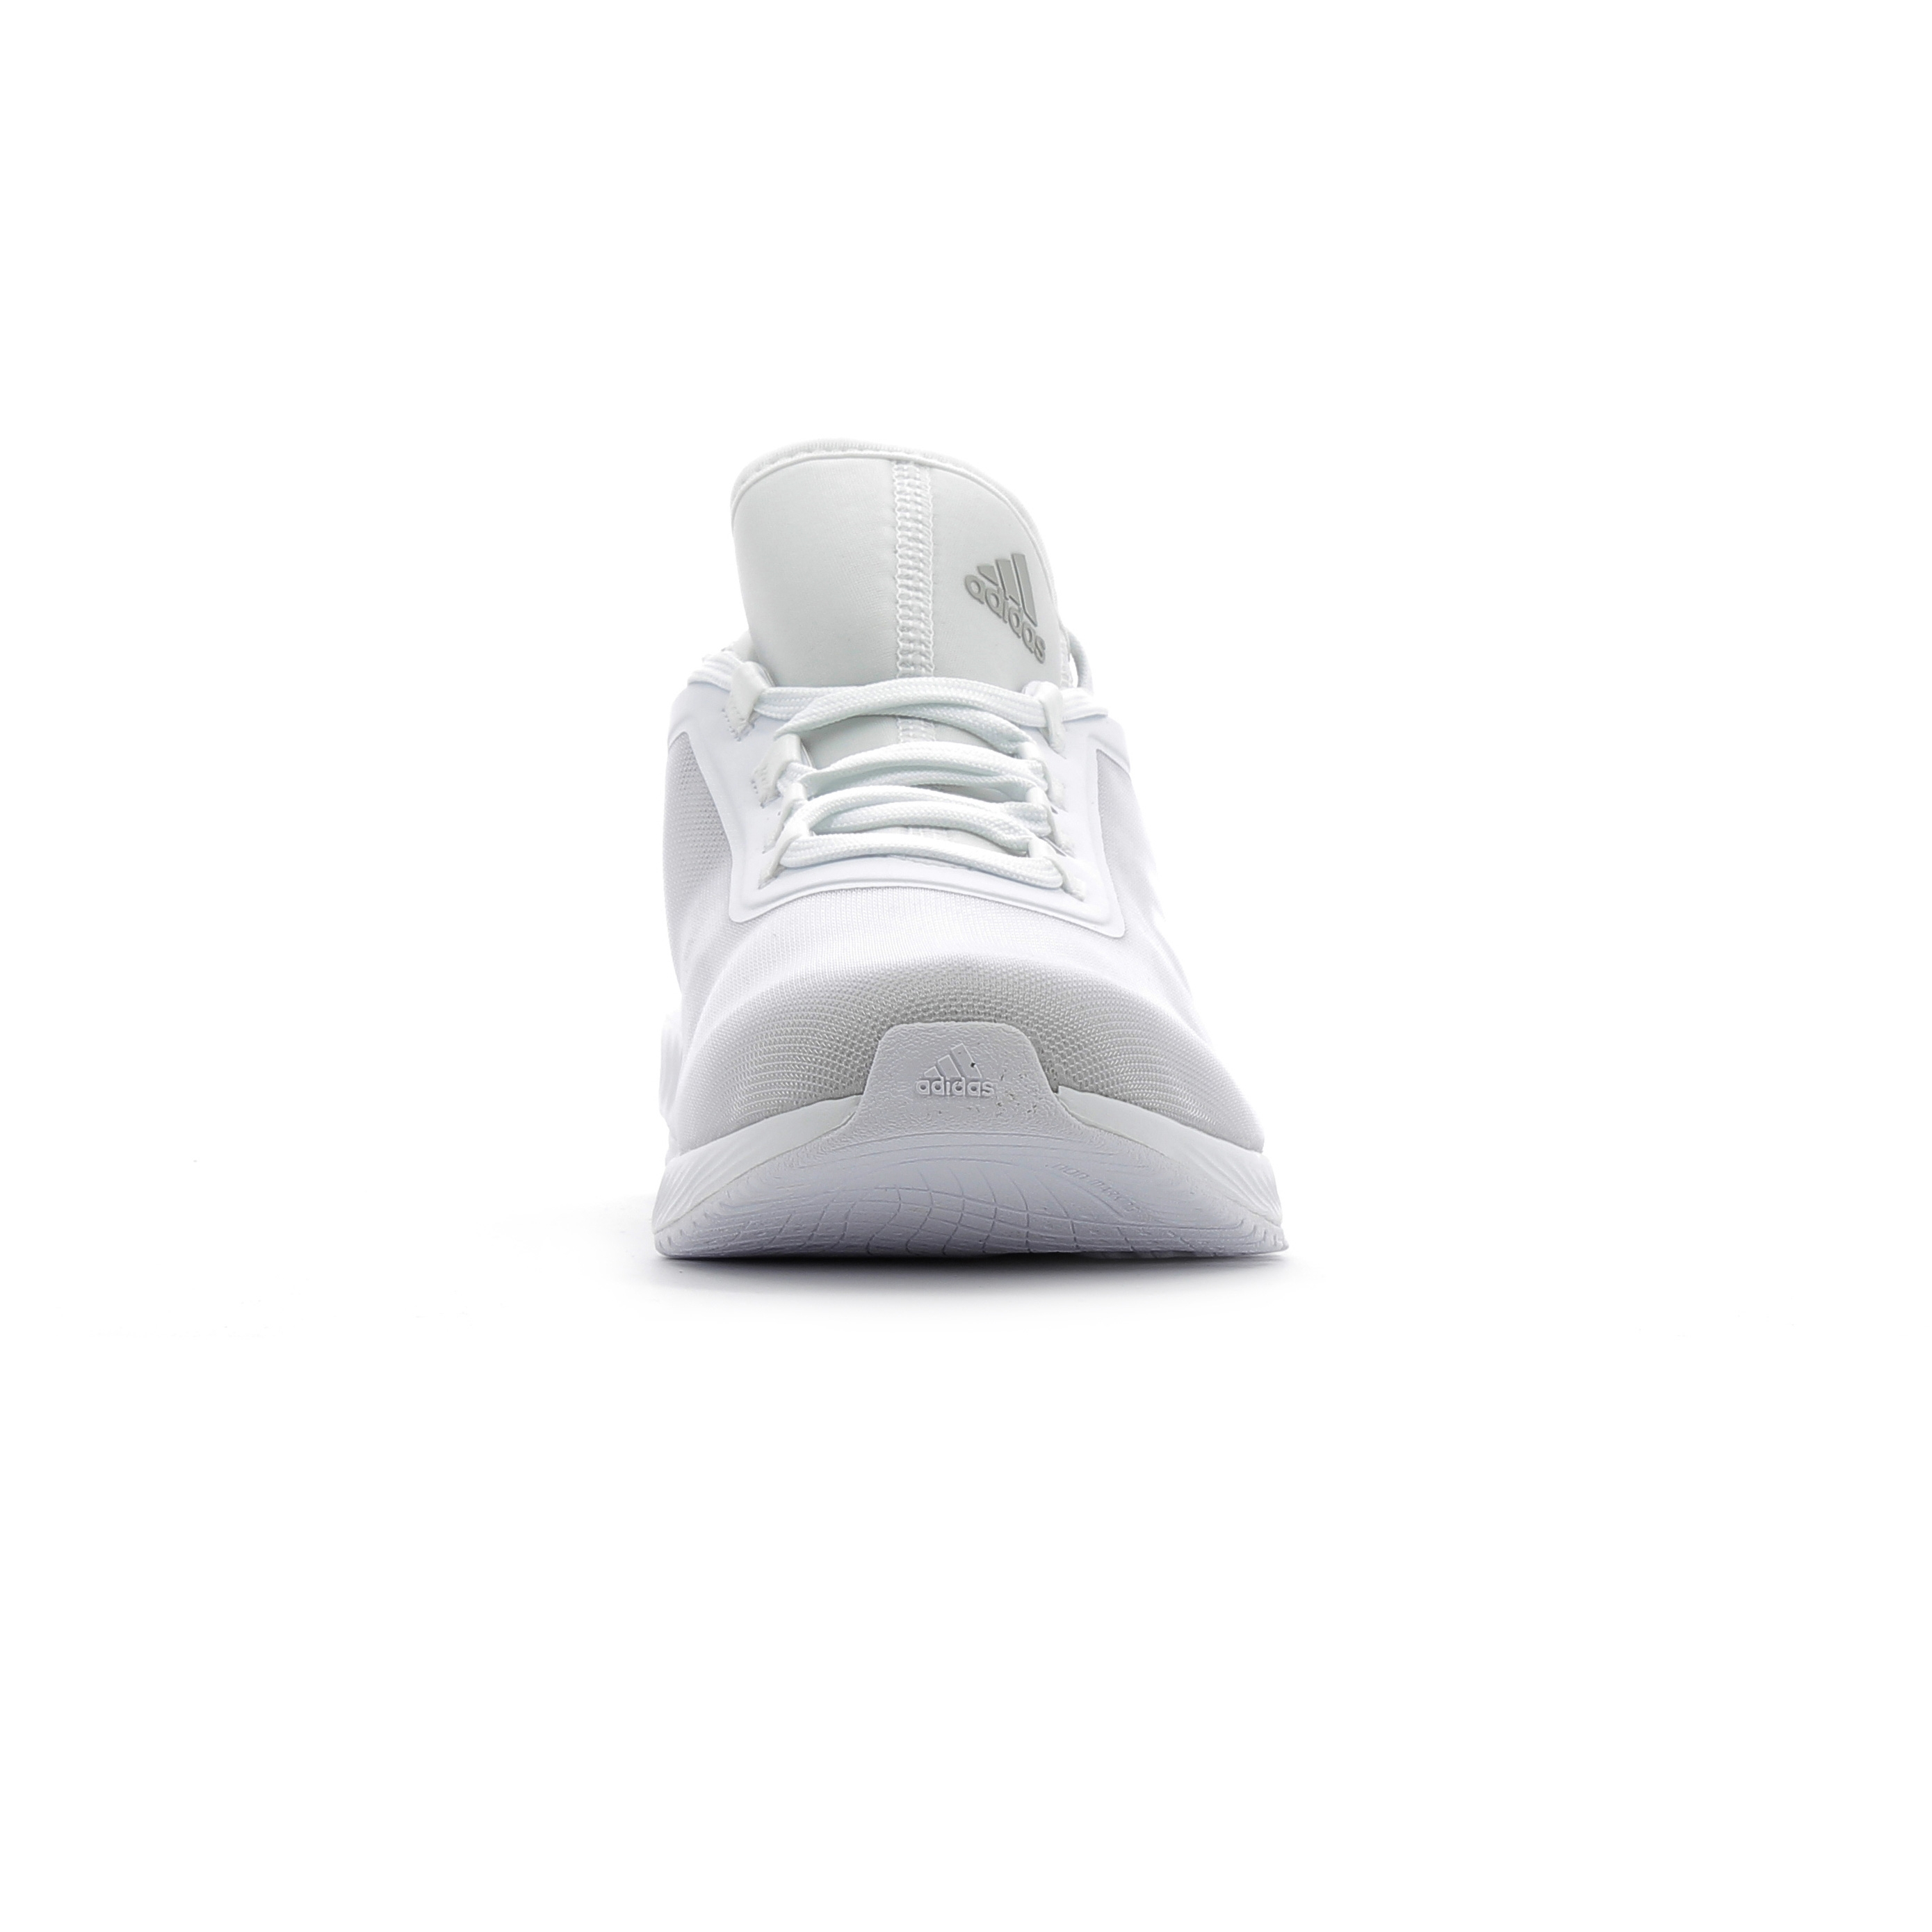 Chaussures de Fitness Adidas Gymbreaker 2 W